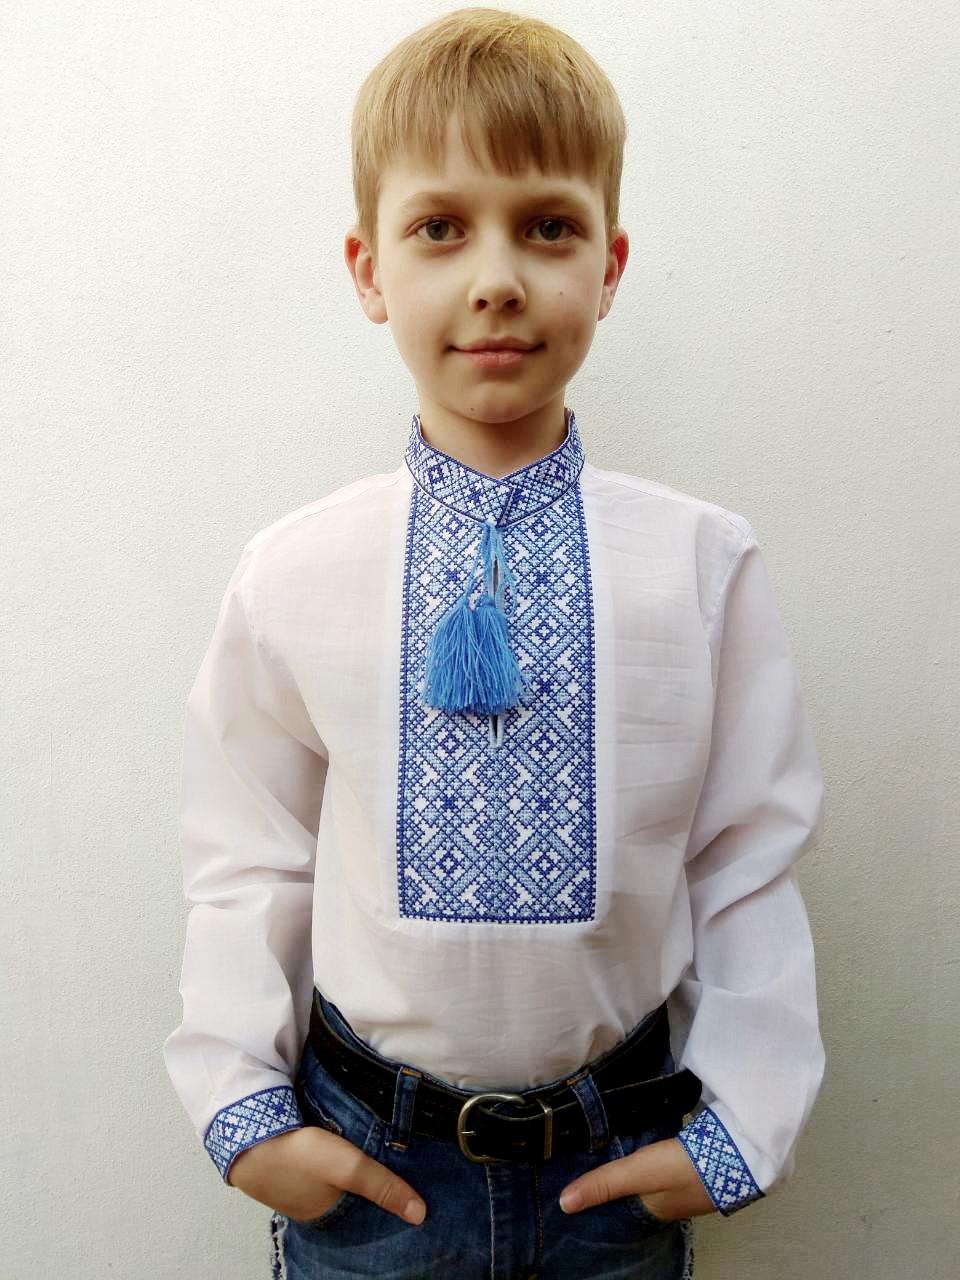 Дитяча вишиванка для хлопчика Данило вишивка синьо-блакитна